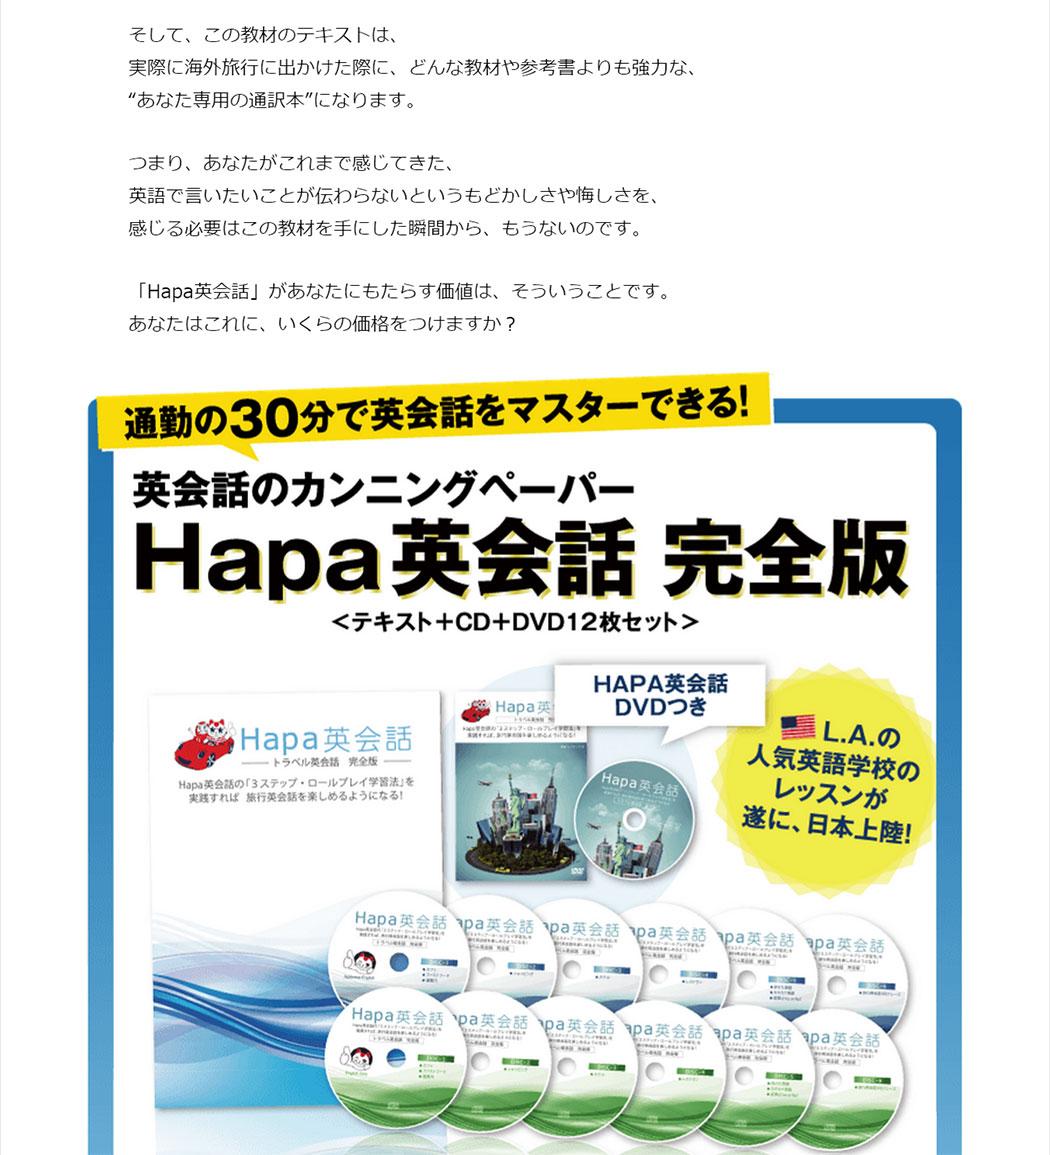 hapa-new-lp30.jpg